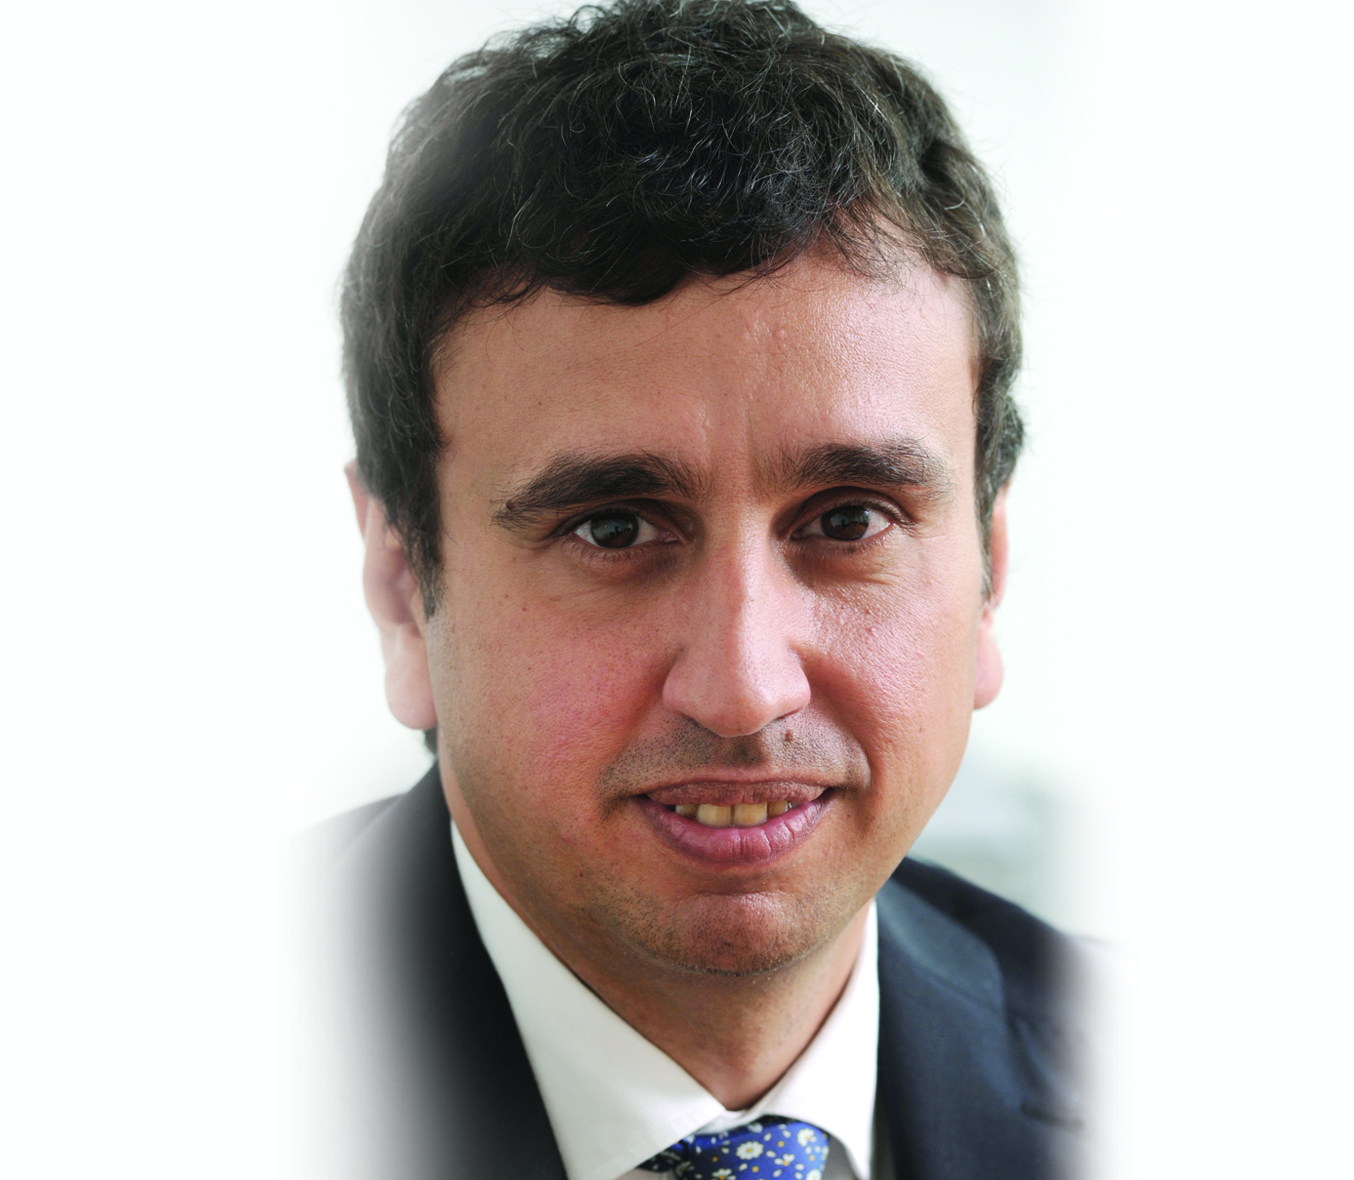 Economie emergenti, bene nel medio-lungo periodo